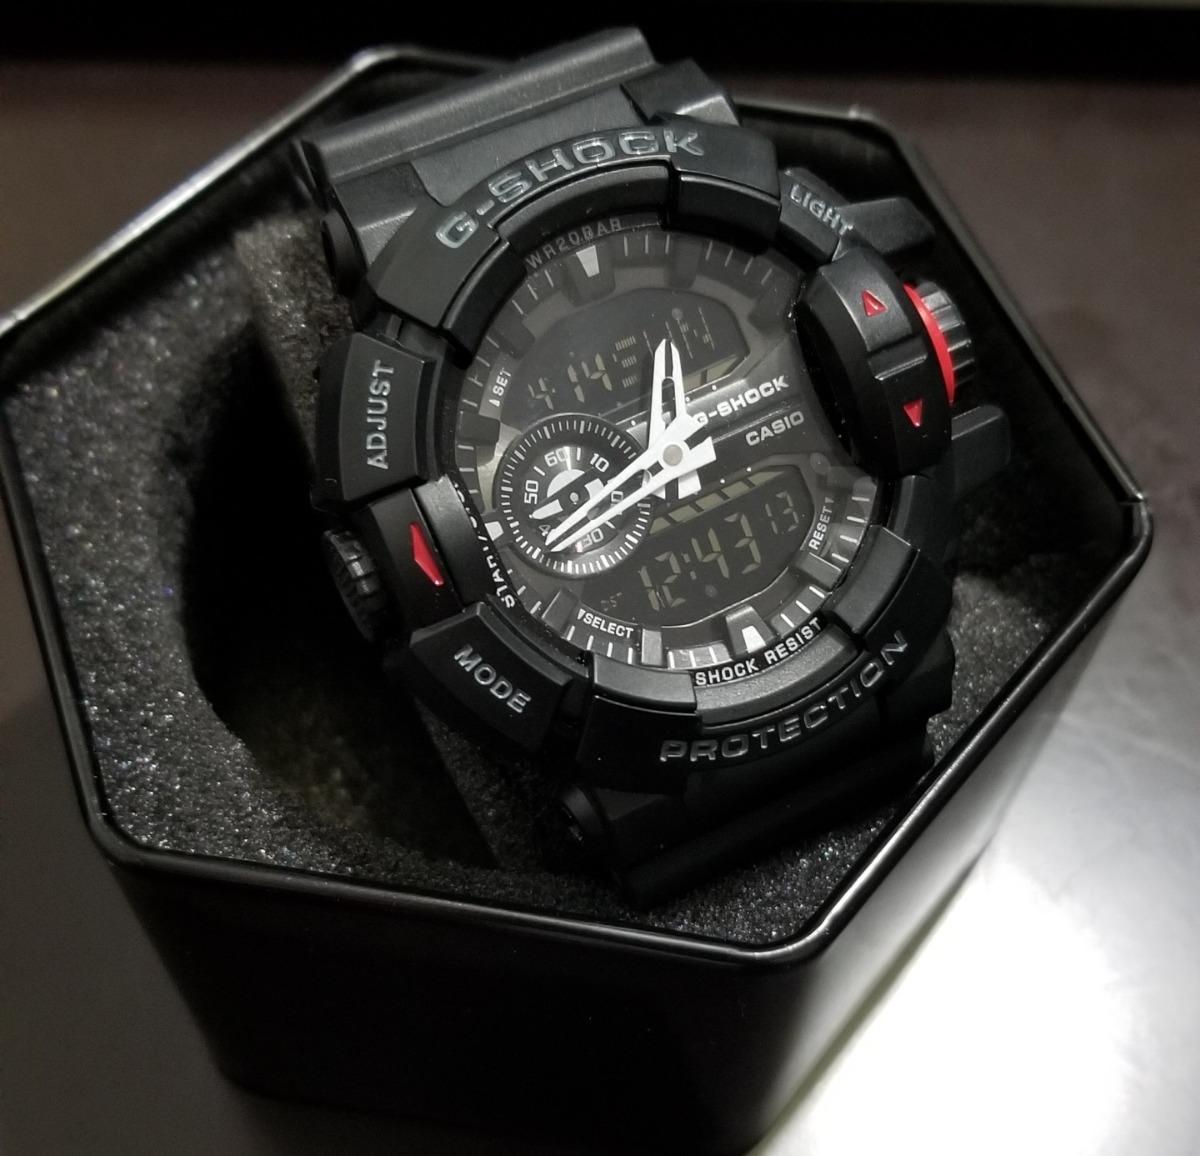 a402490fd6 Reloj Casio G-shock Ga-400 Ga 400 Analogico-digital - $ 2,699.00 en ...